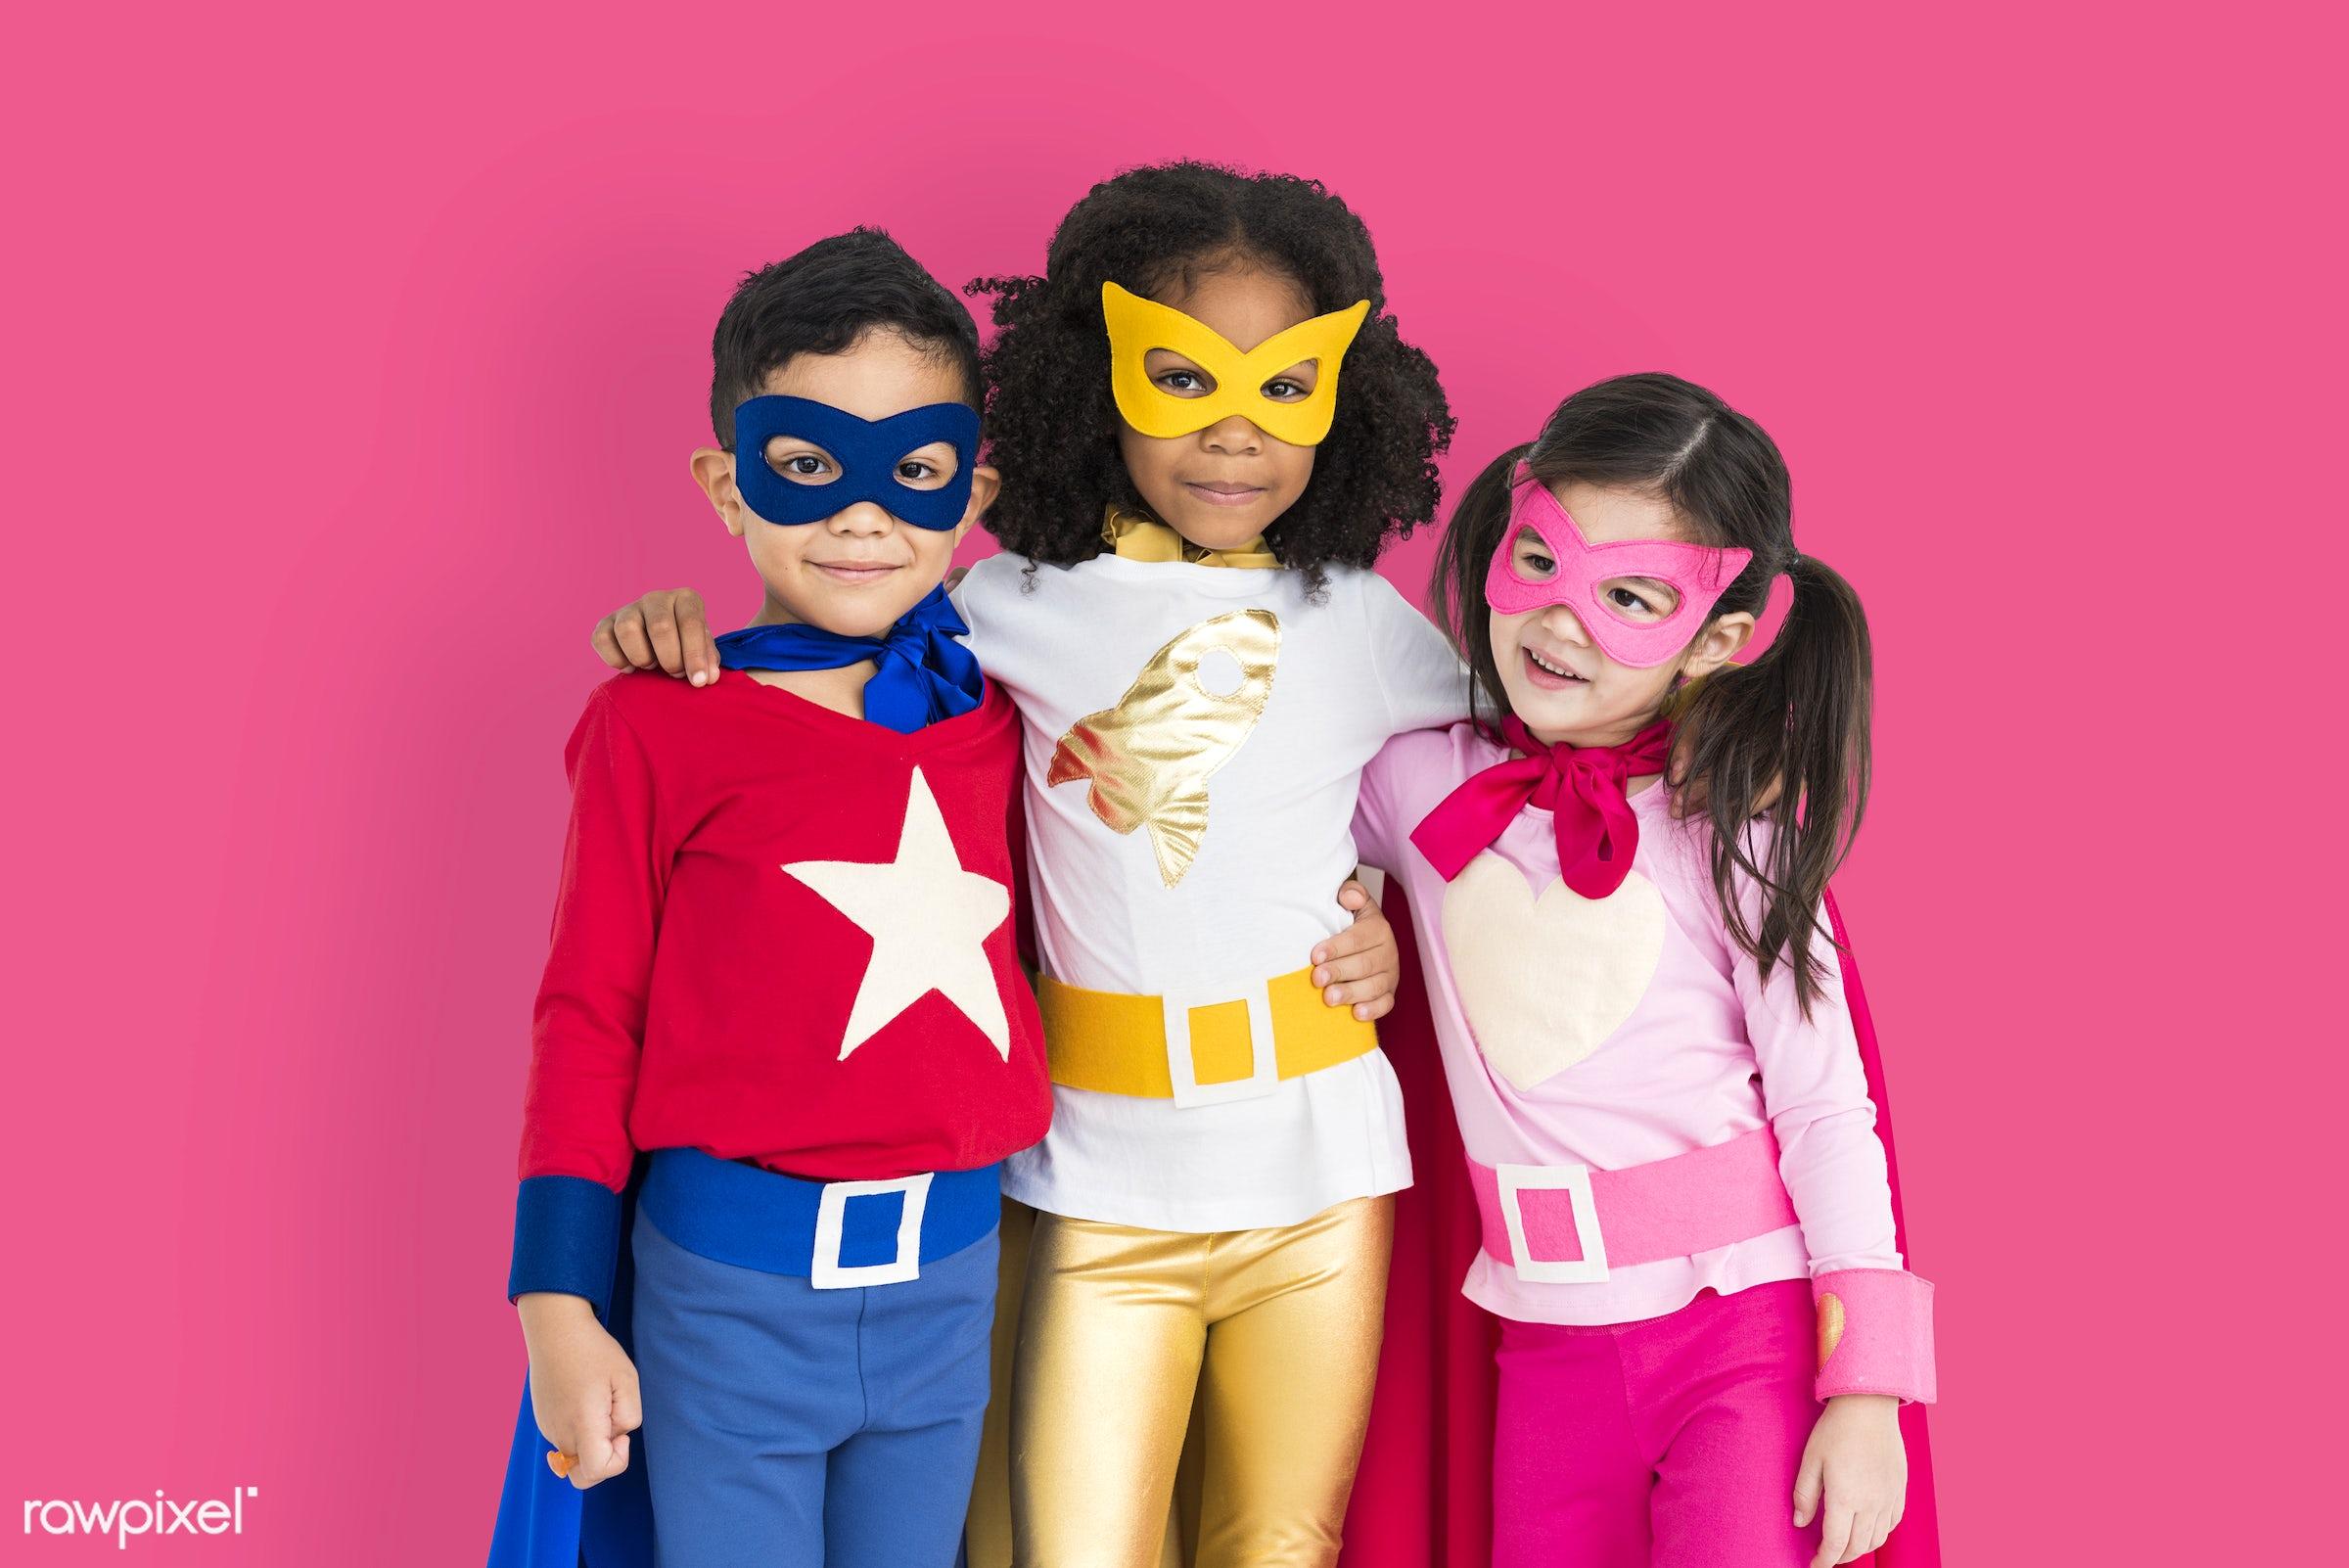 children, courageous, kid, adolescence, child, girl, inspiration, leader, pink, idol, childhood, superhero, isolated, hero,...